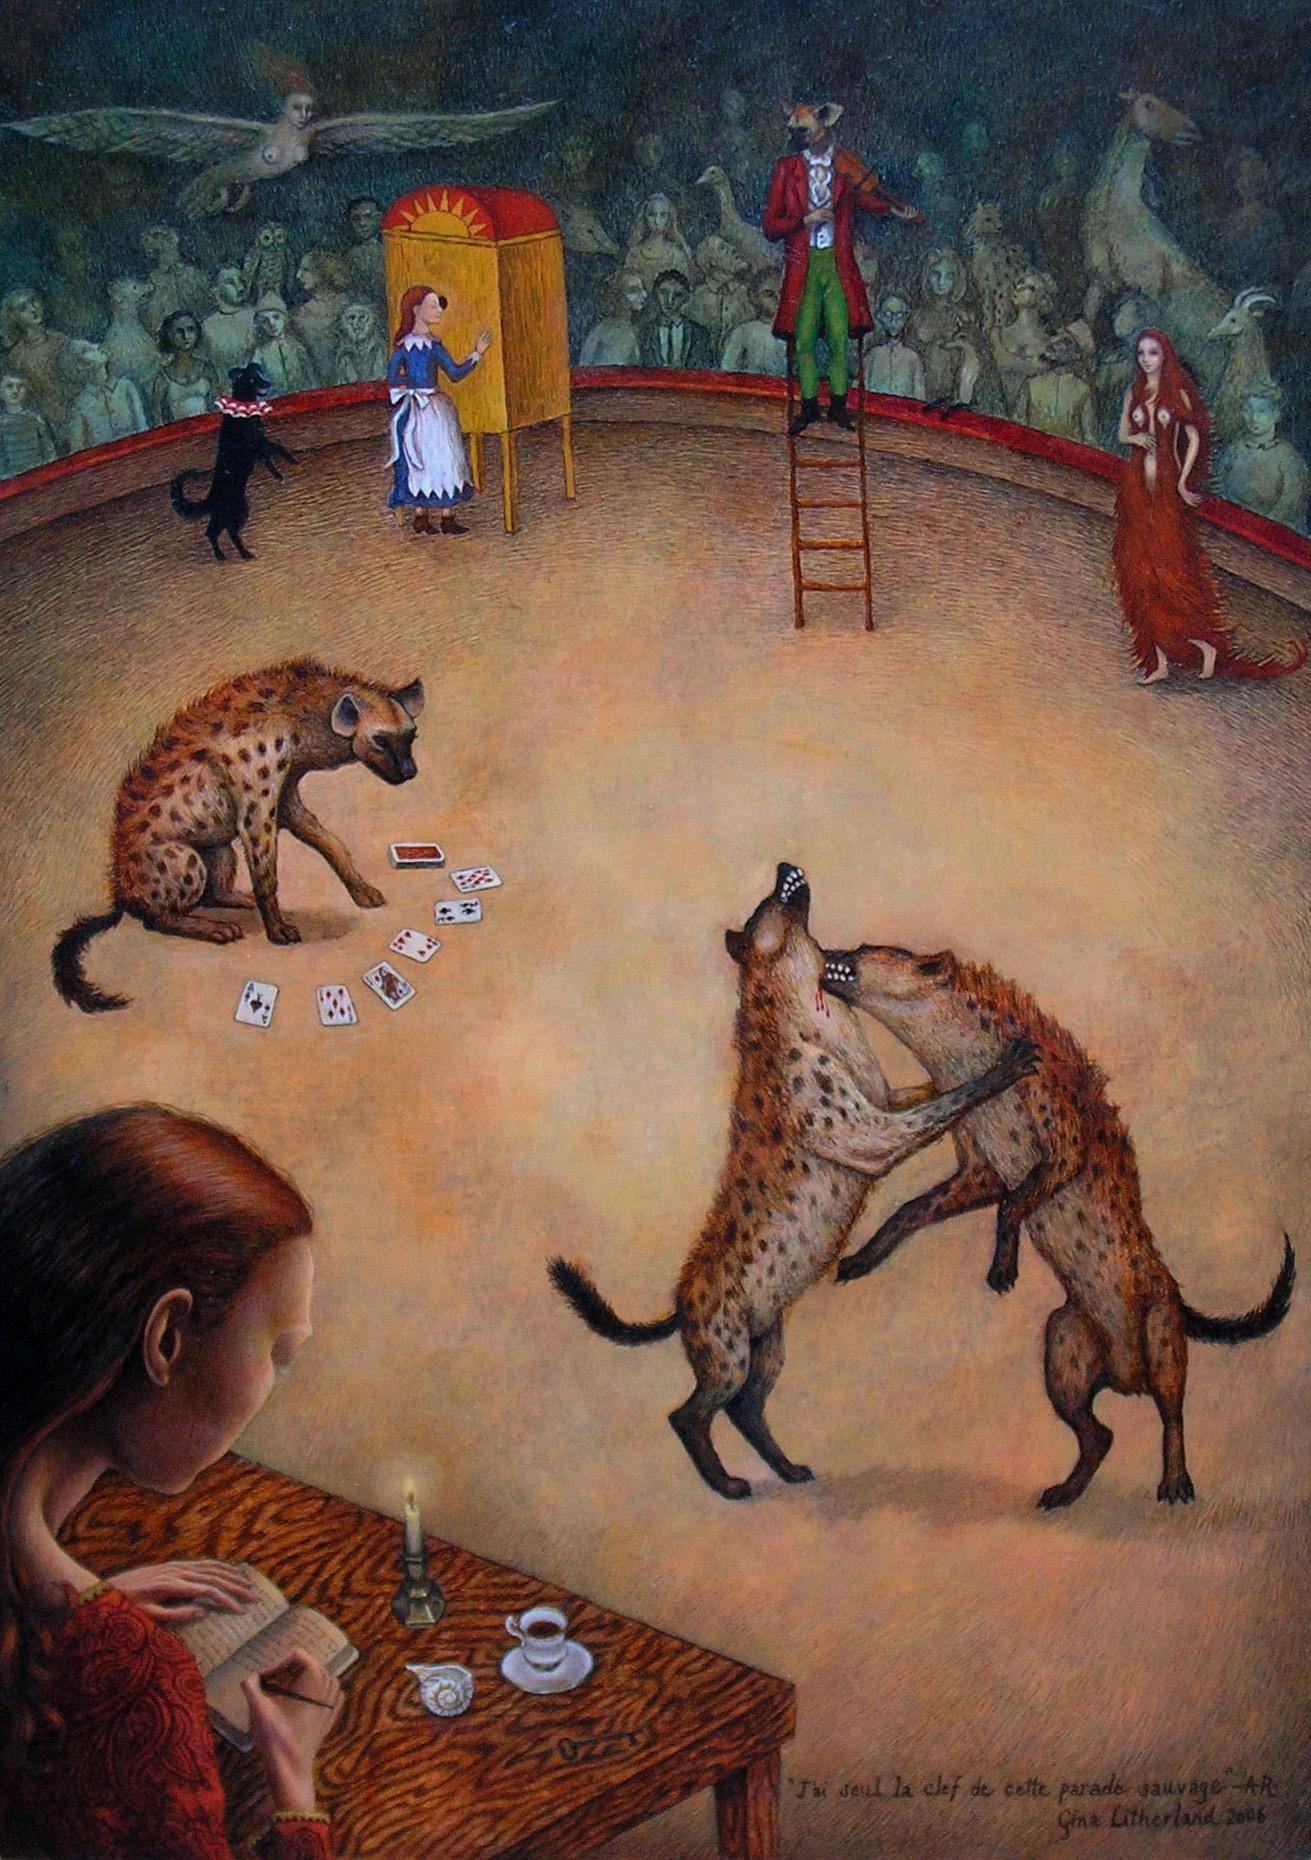 Sideshow, 2006